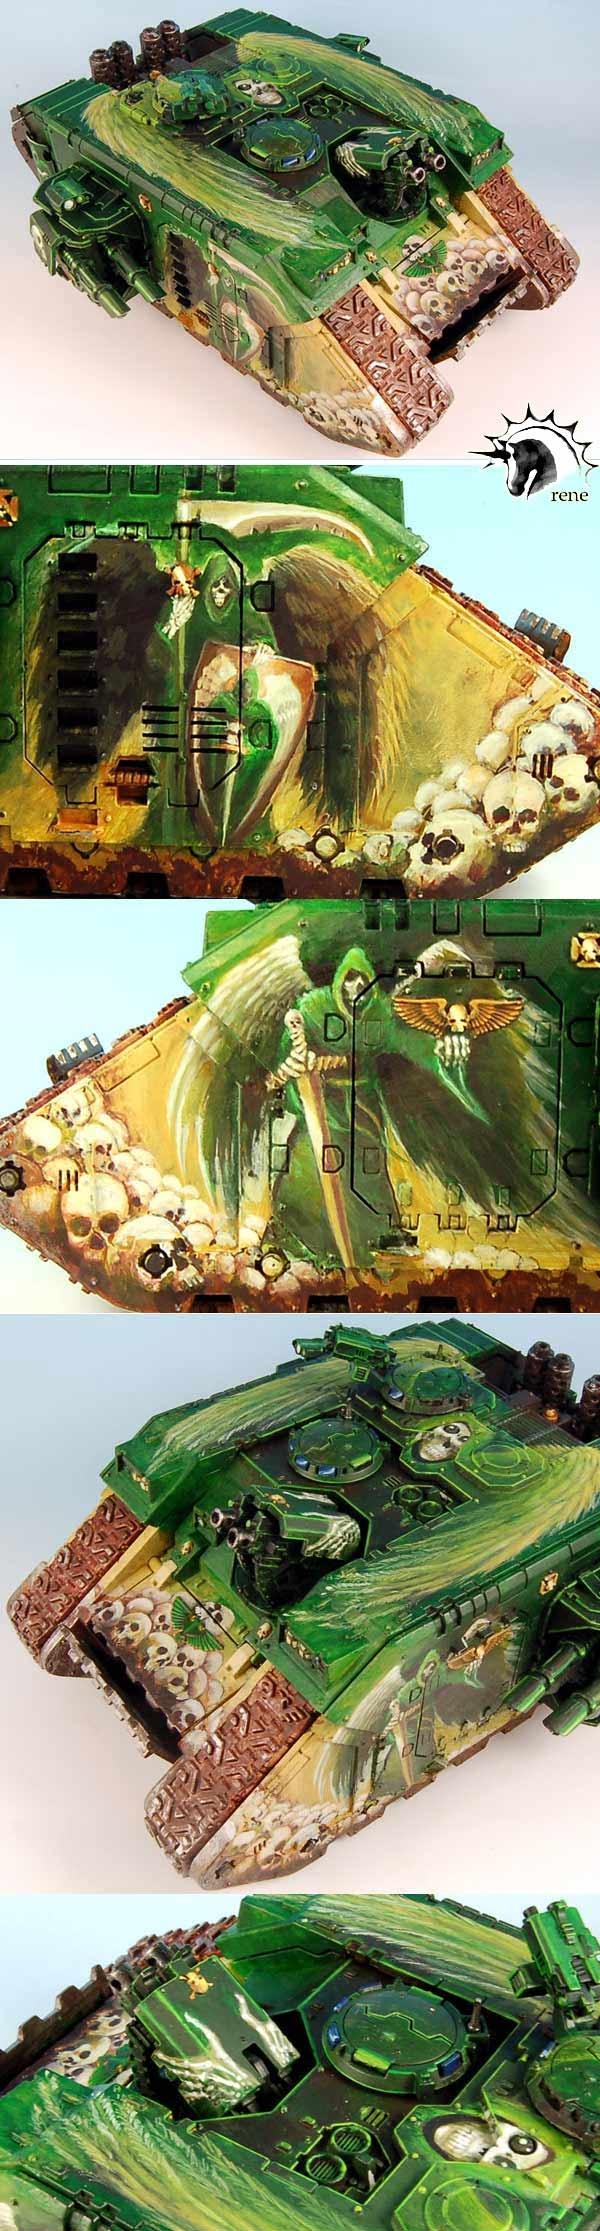 CoolMiniOrNot - WARHAMMER 40K Dark Angels Land Raider by rene  Wow, nice painting